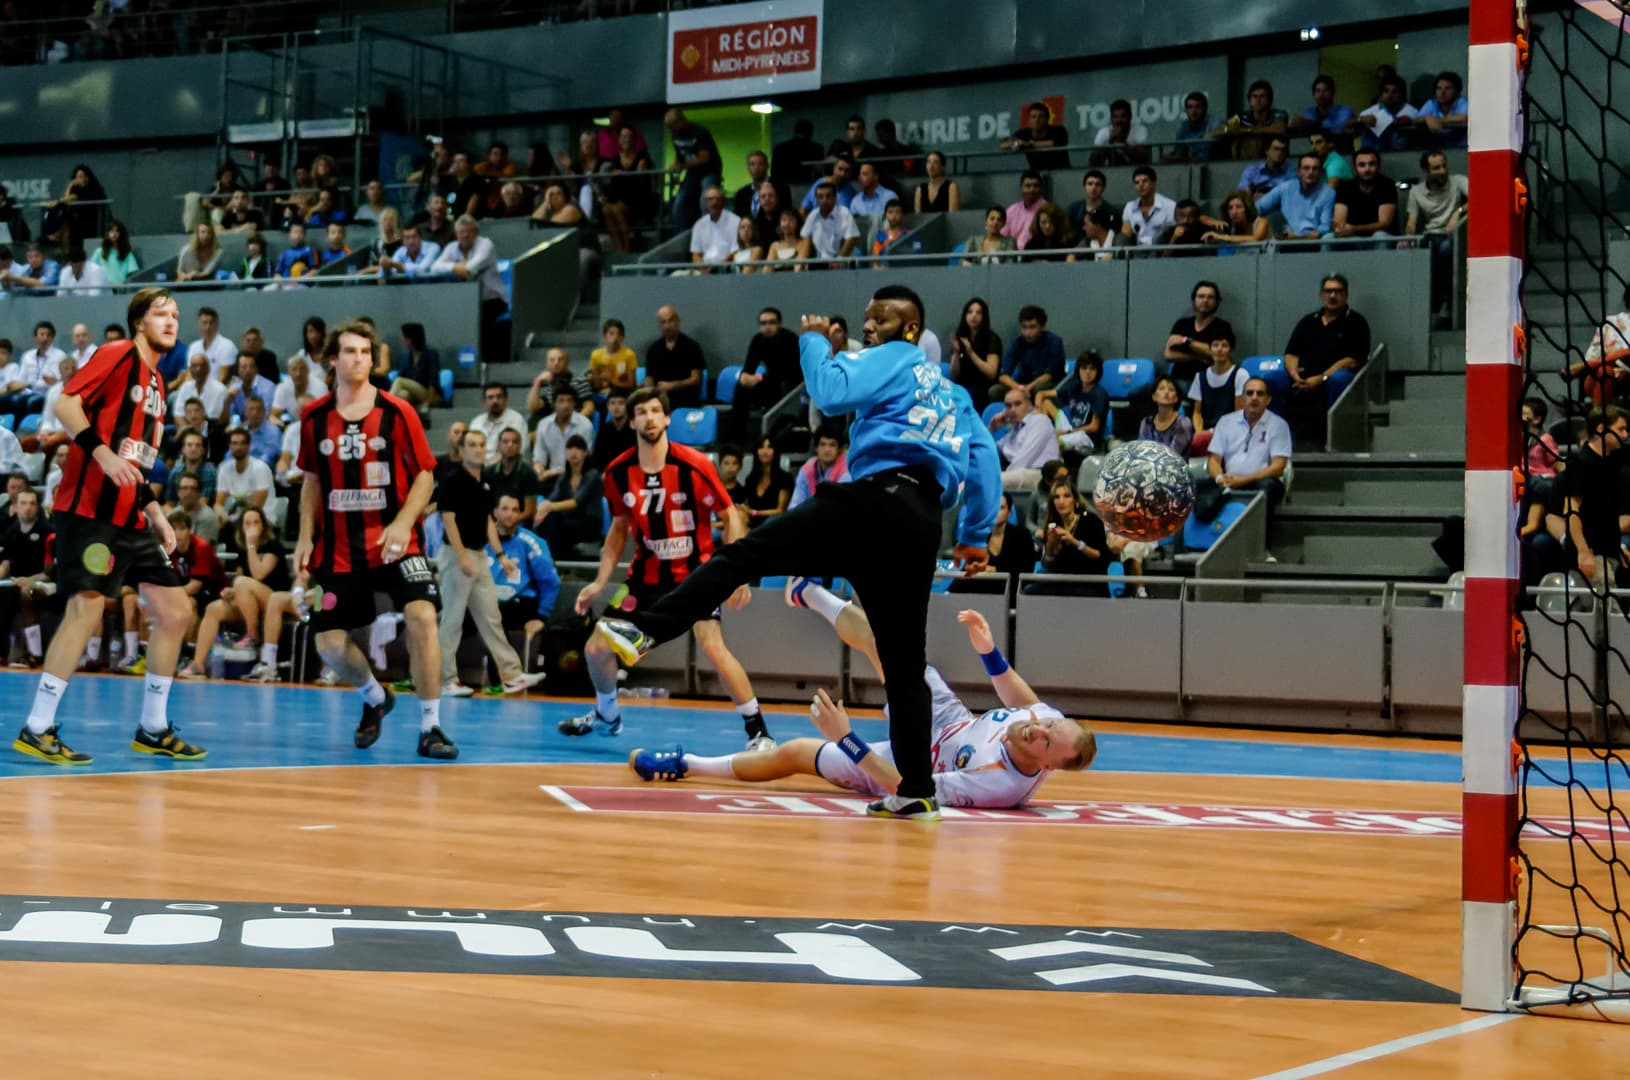 Photographe sportif handball toulouse - Fénix